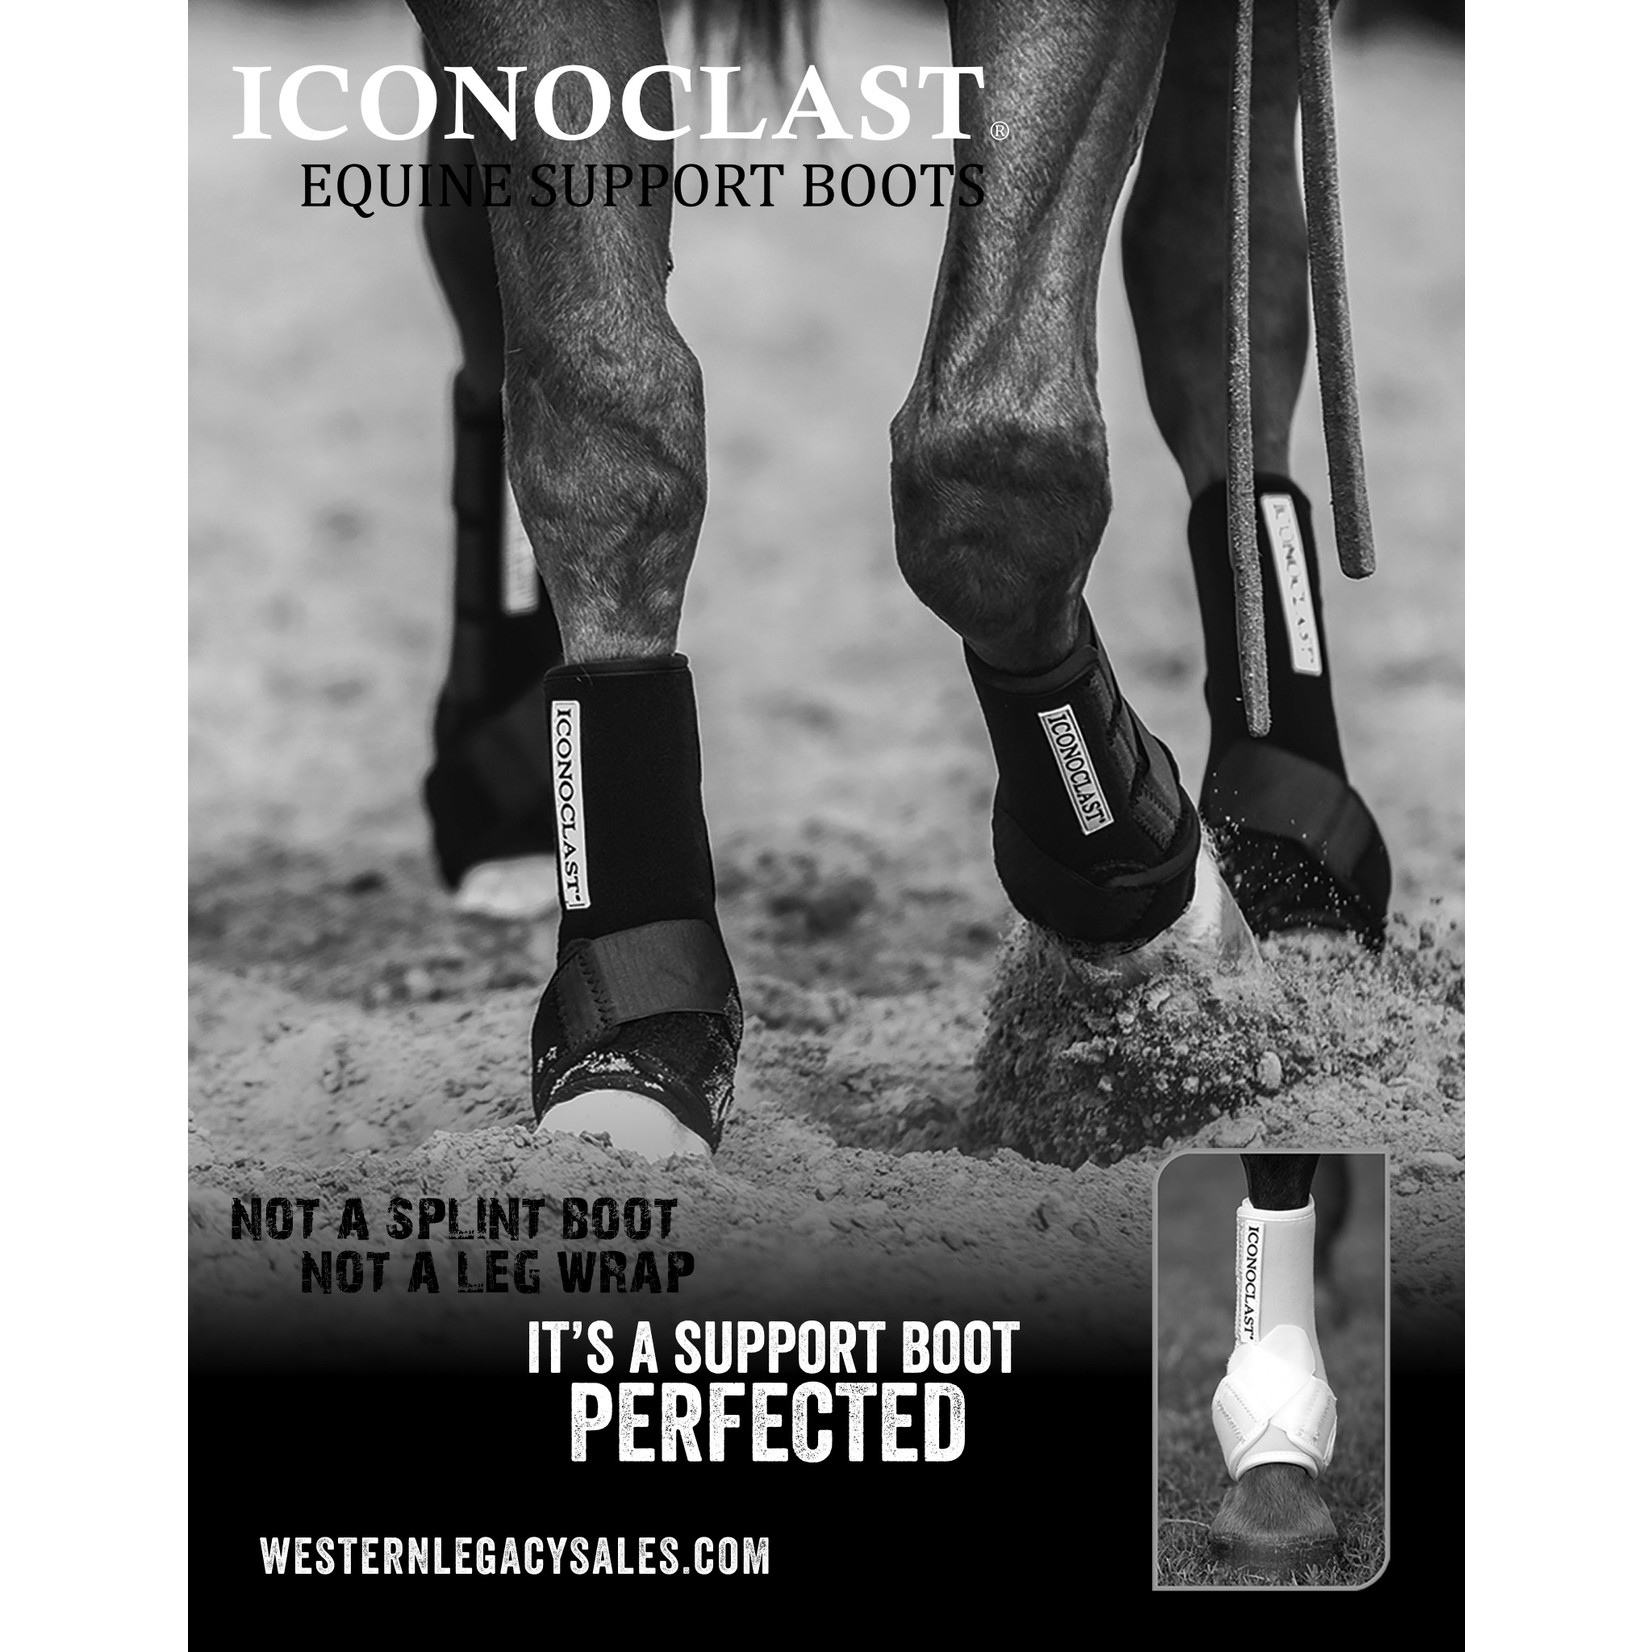 Iconoclast F Boots Wht/Lrg